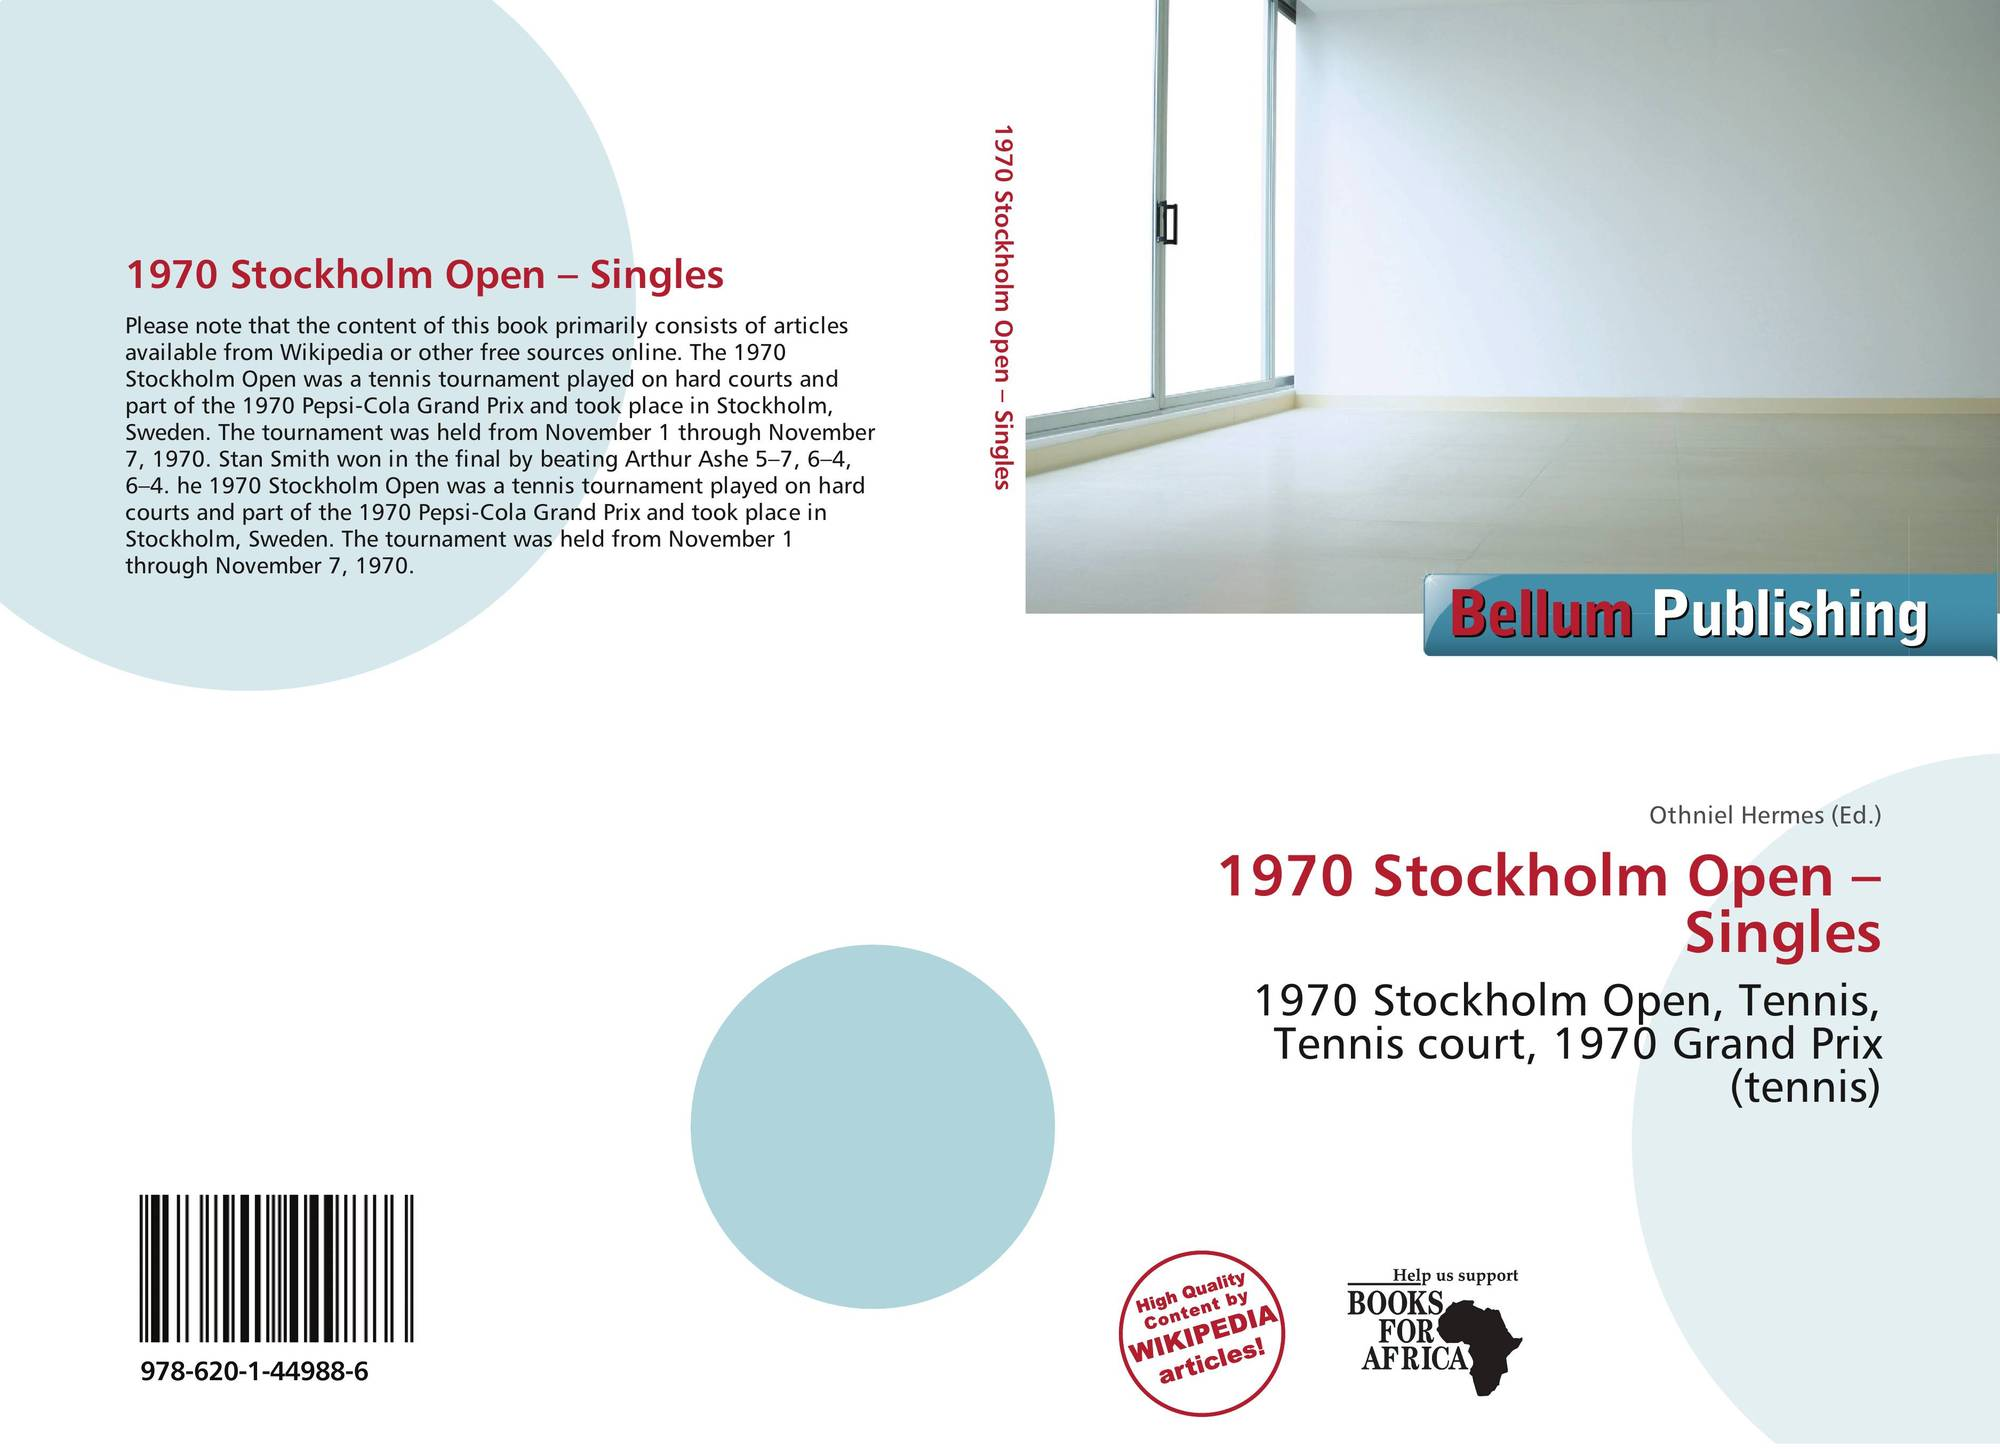 1973 Stockholm Open – Singles